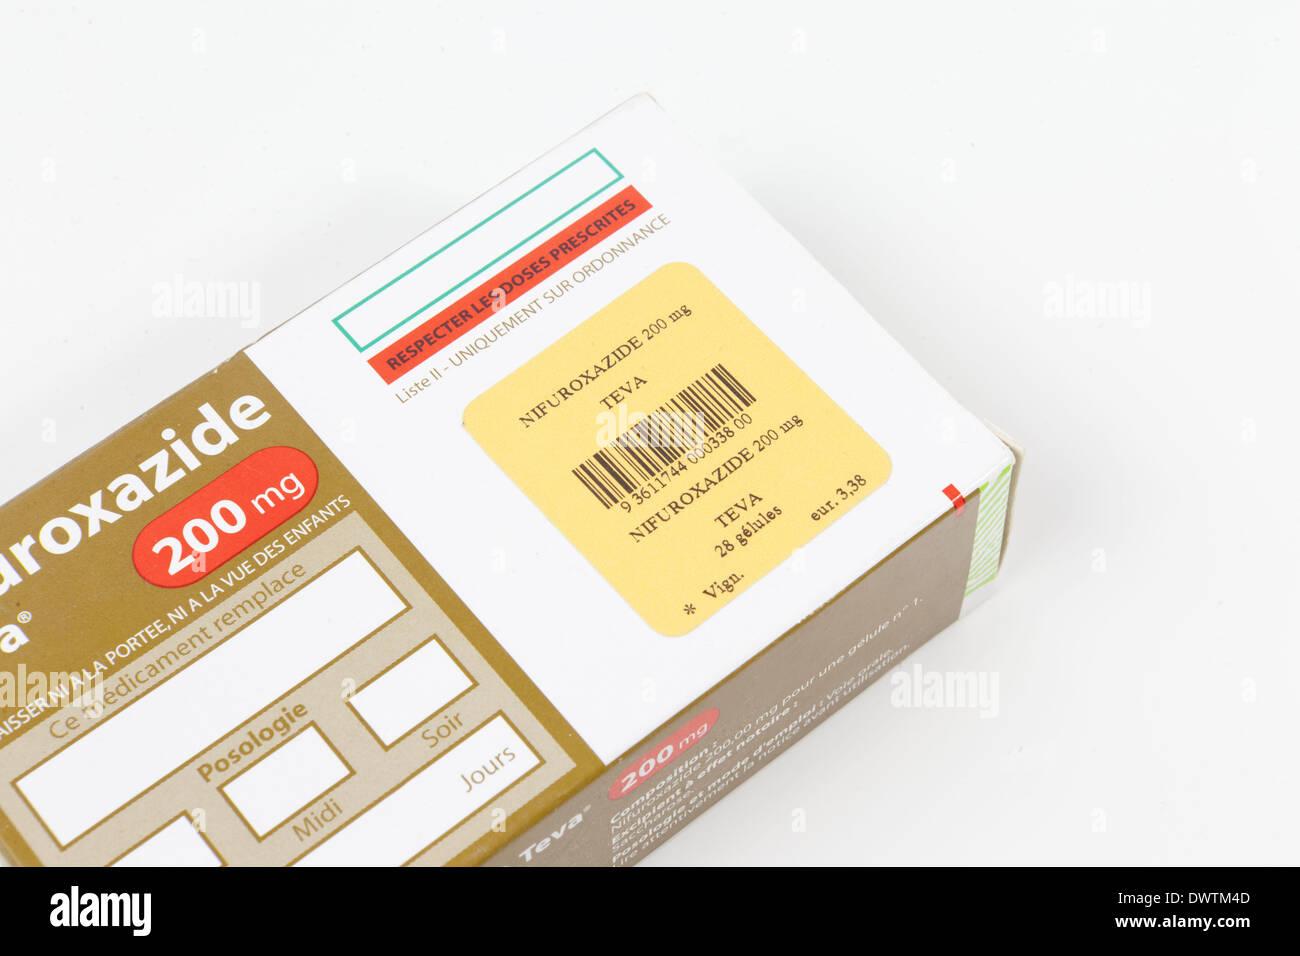 Nifuroxazide Stock Photos & Nifuroxazide Stock Images - Alamy